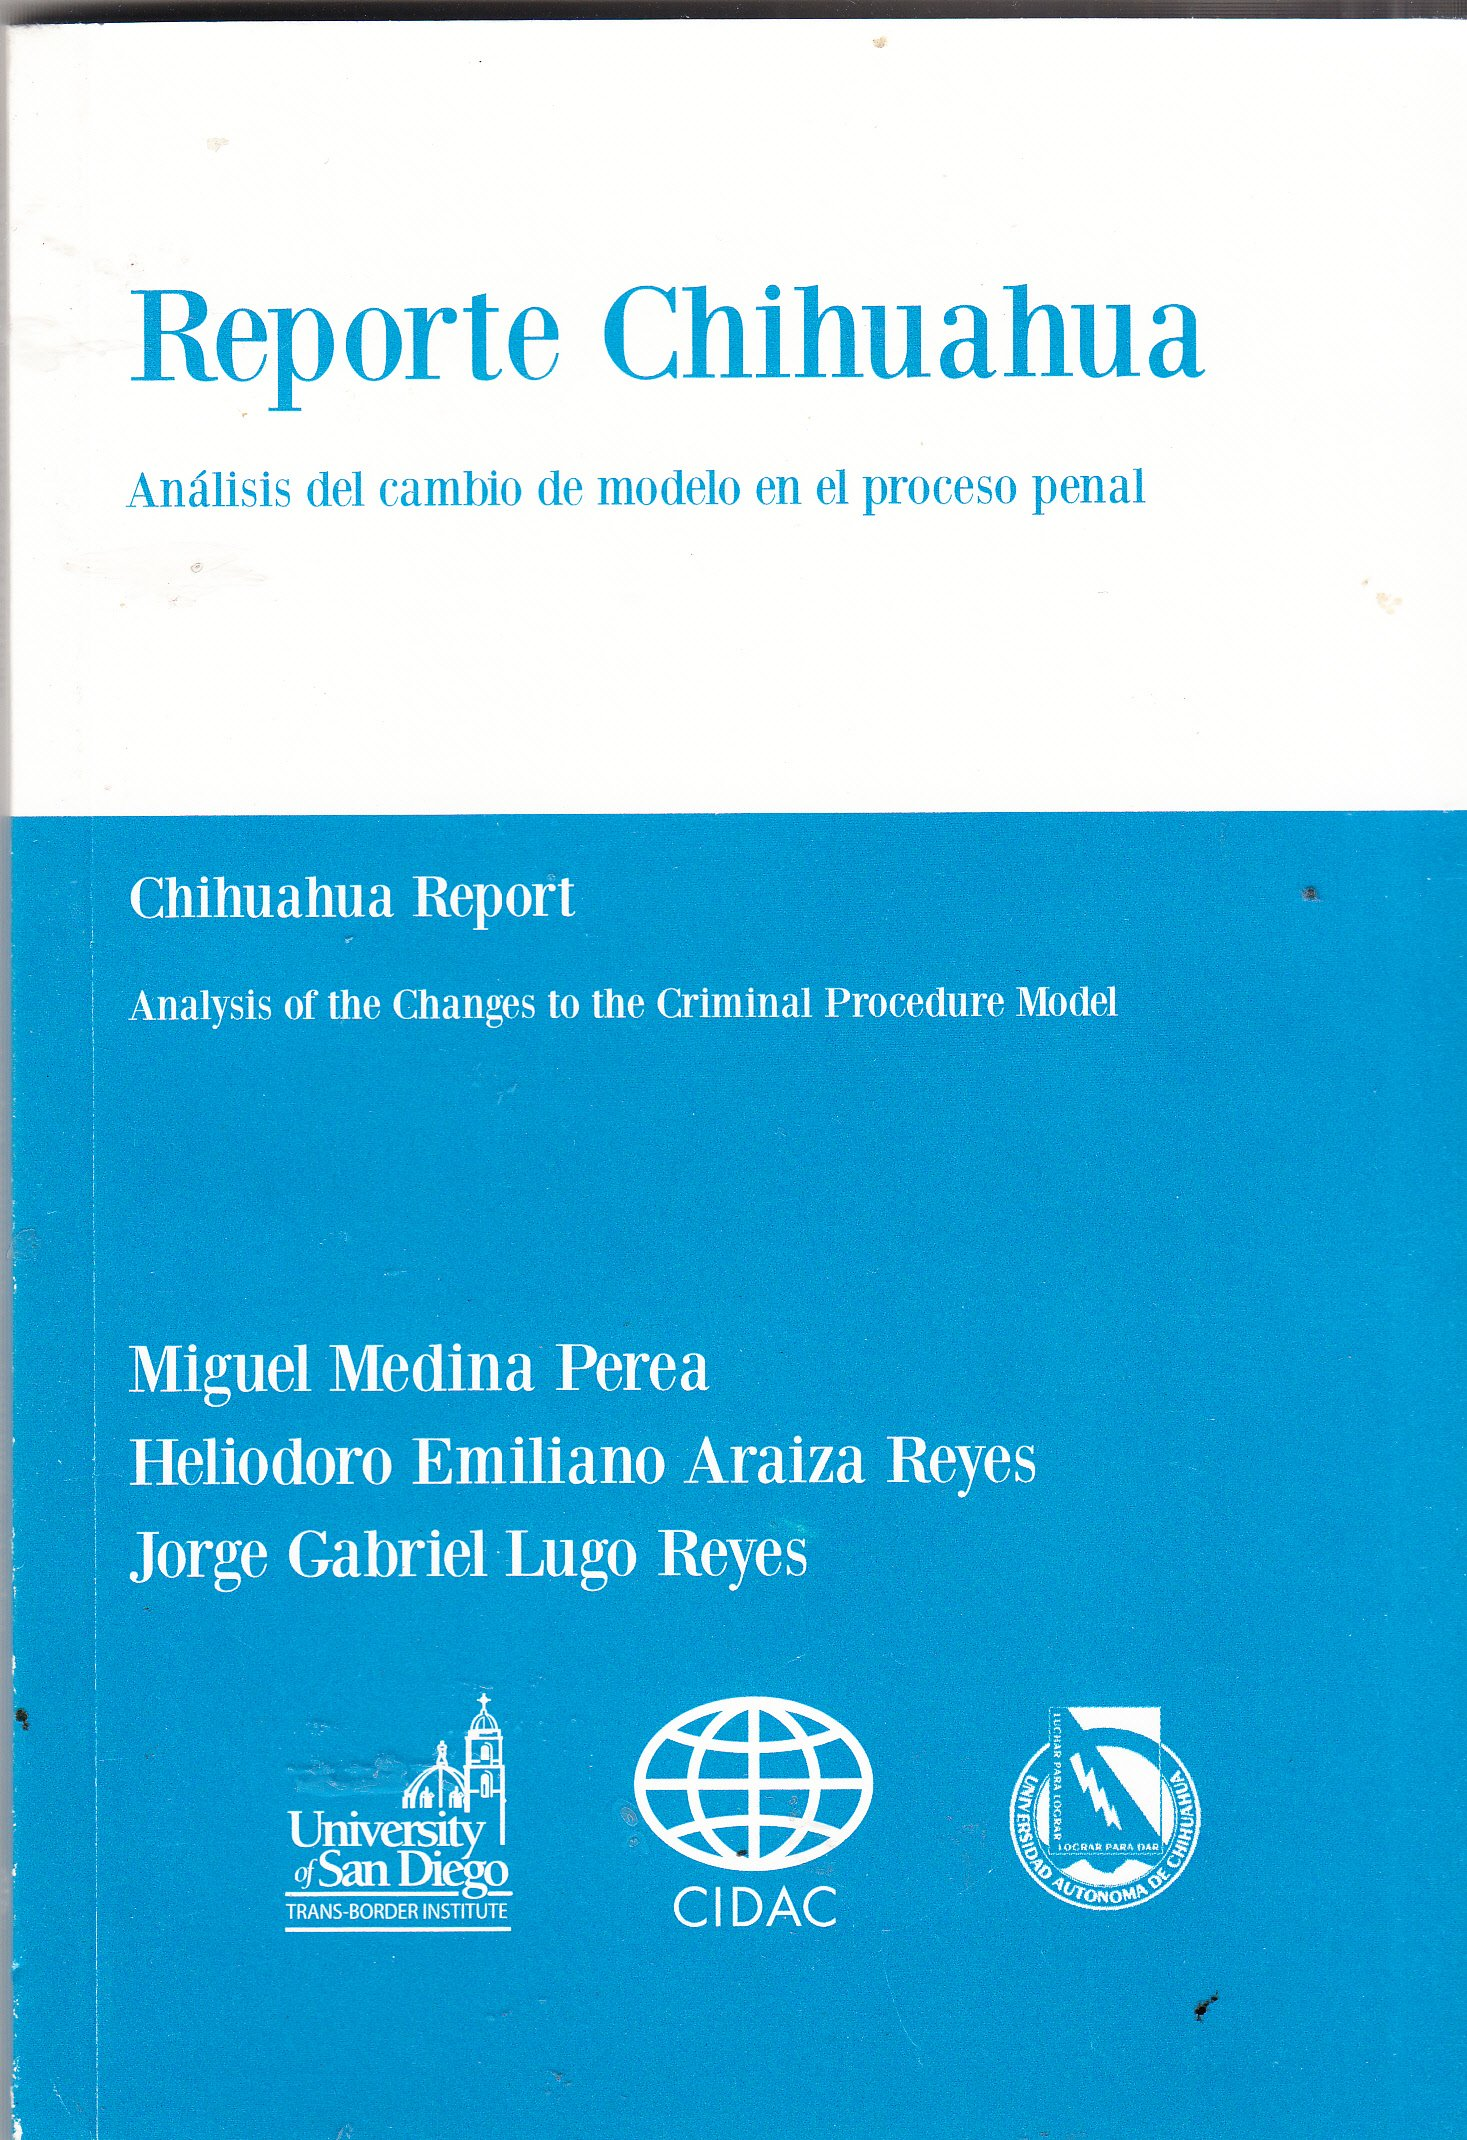 Amazon.com: REPORTE CHIHUAHUA: Análisis del cambio de modelo ...